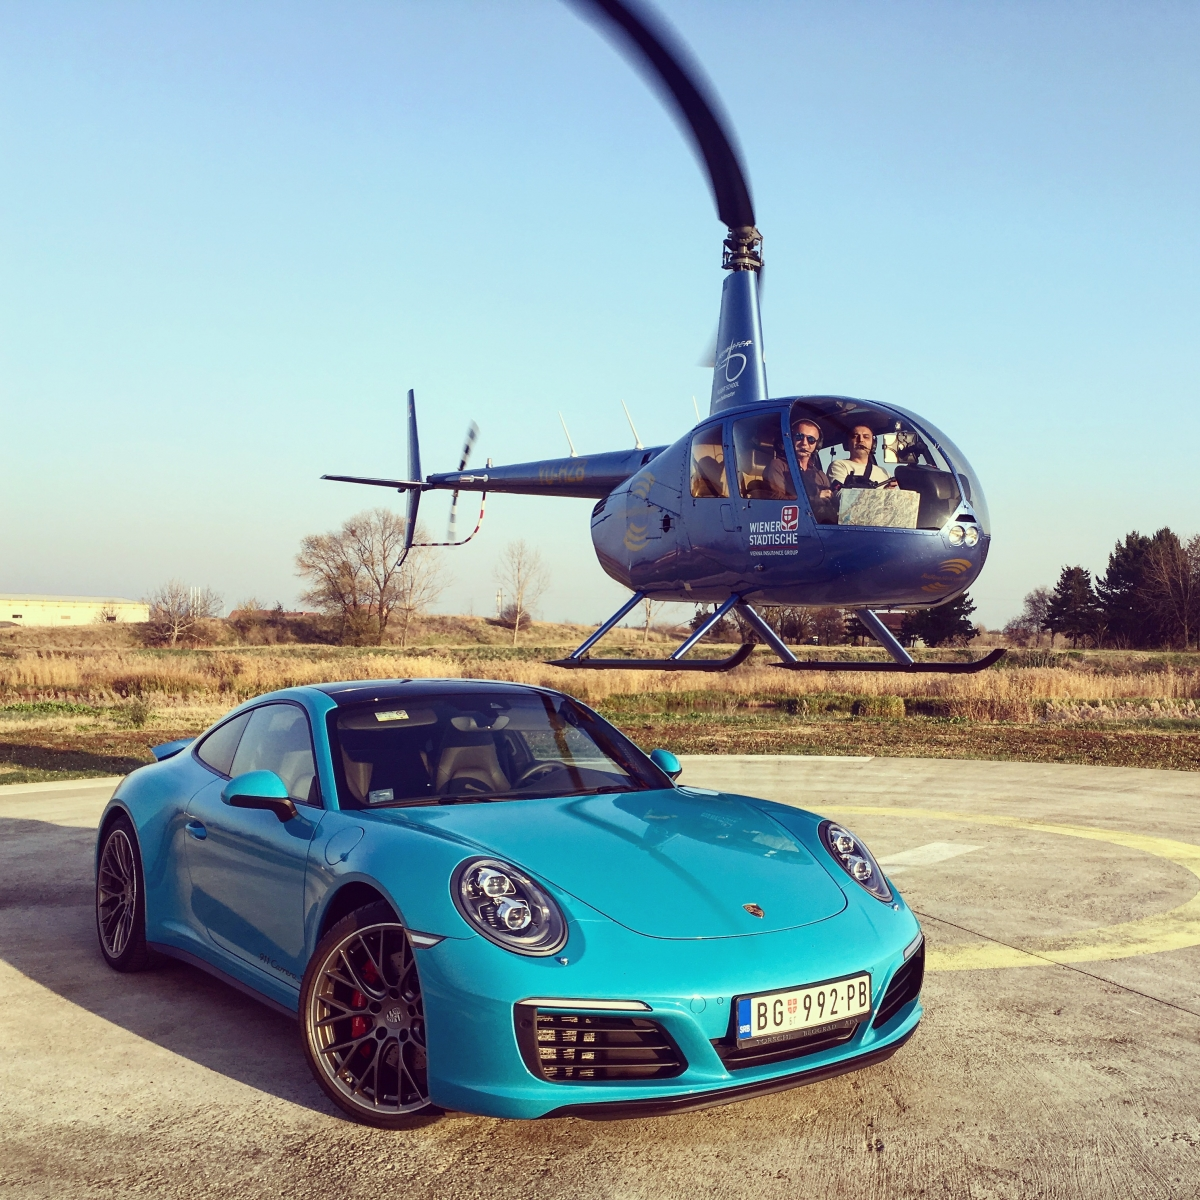 Balkan Helicopters